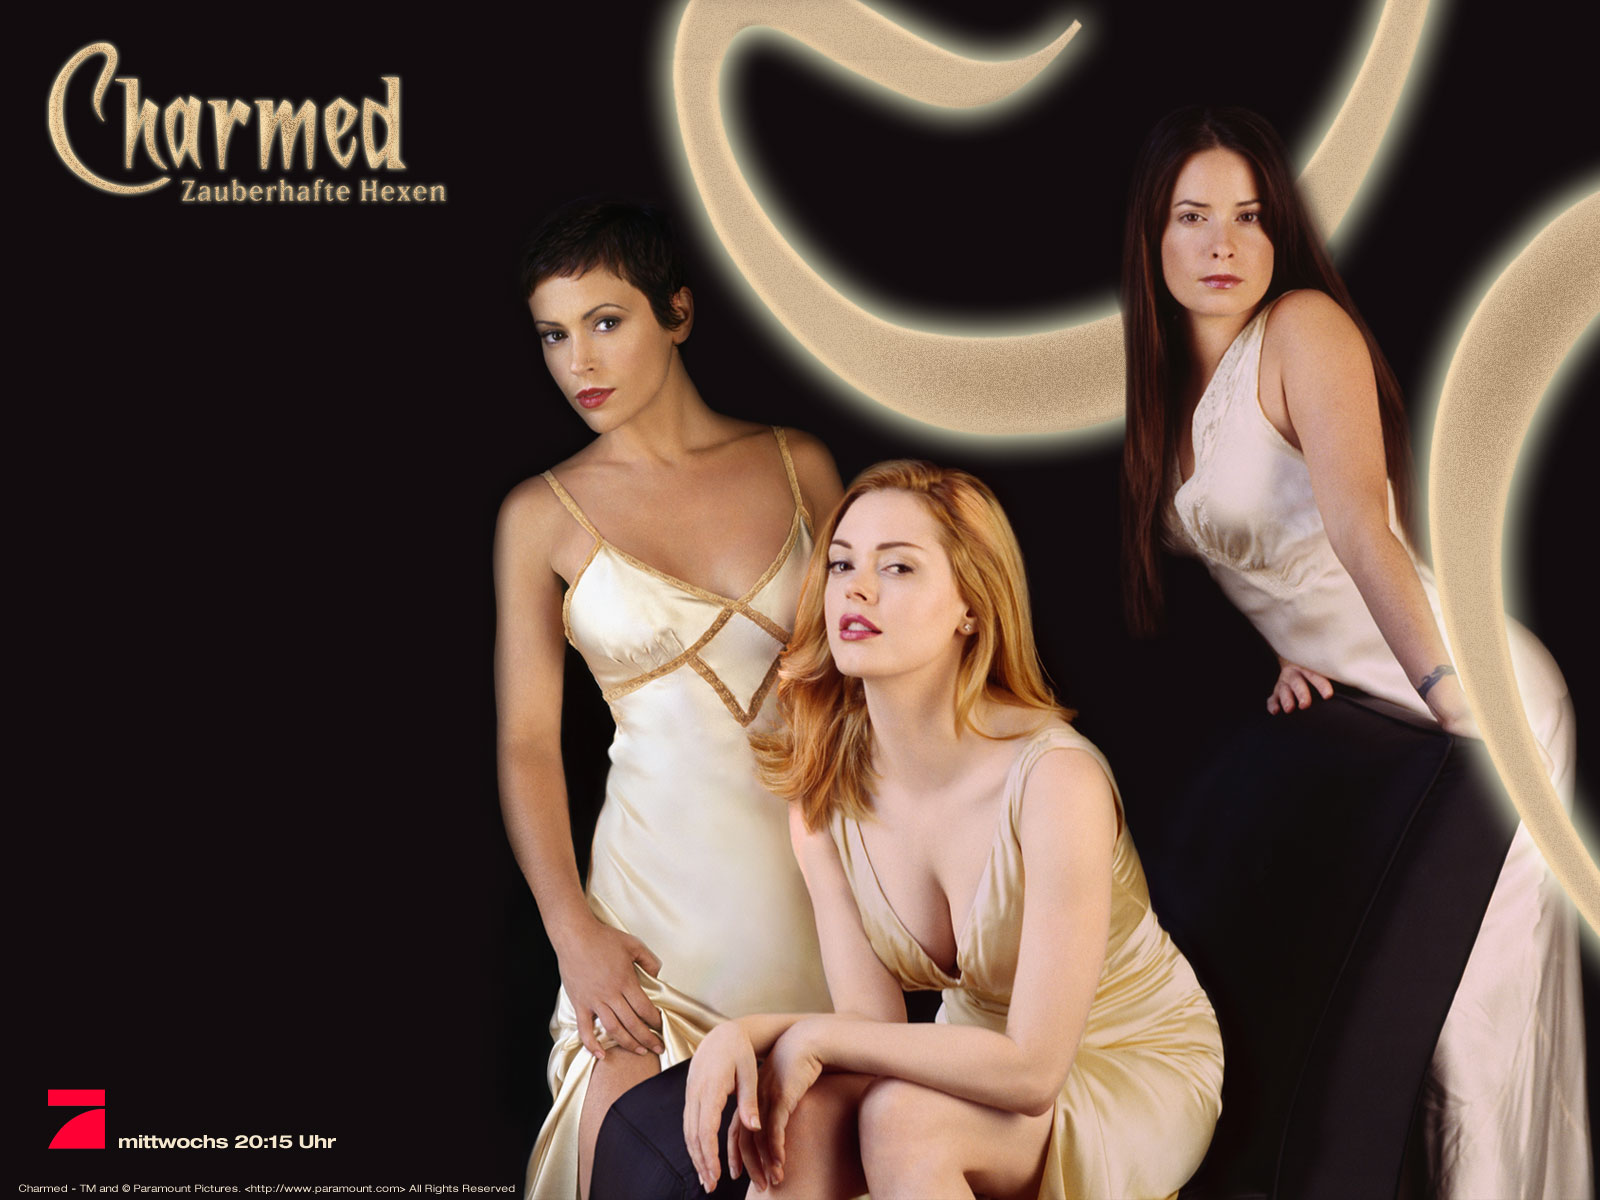 http://4.bp.blogspot.com/-jse4E4FBvY8/T59AJFLOavI/AAAAAAAAHQY/vK_2-v8_YLk/s1600/Charmed.jpg